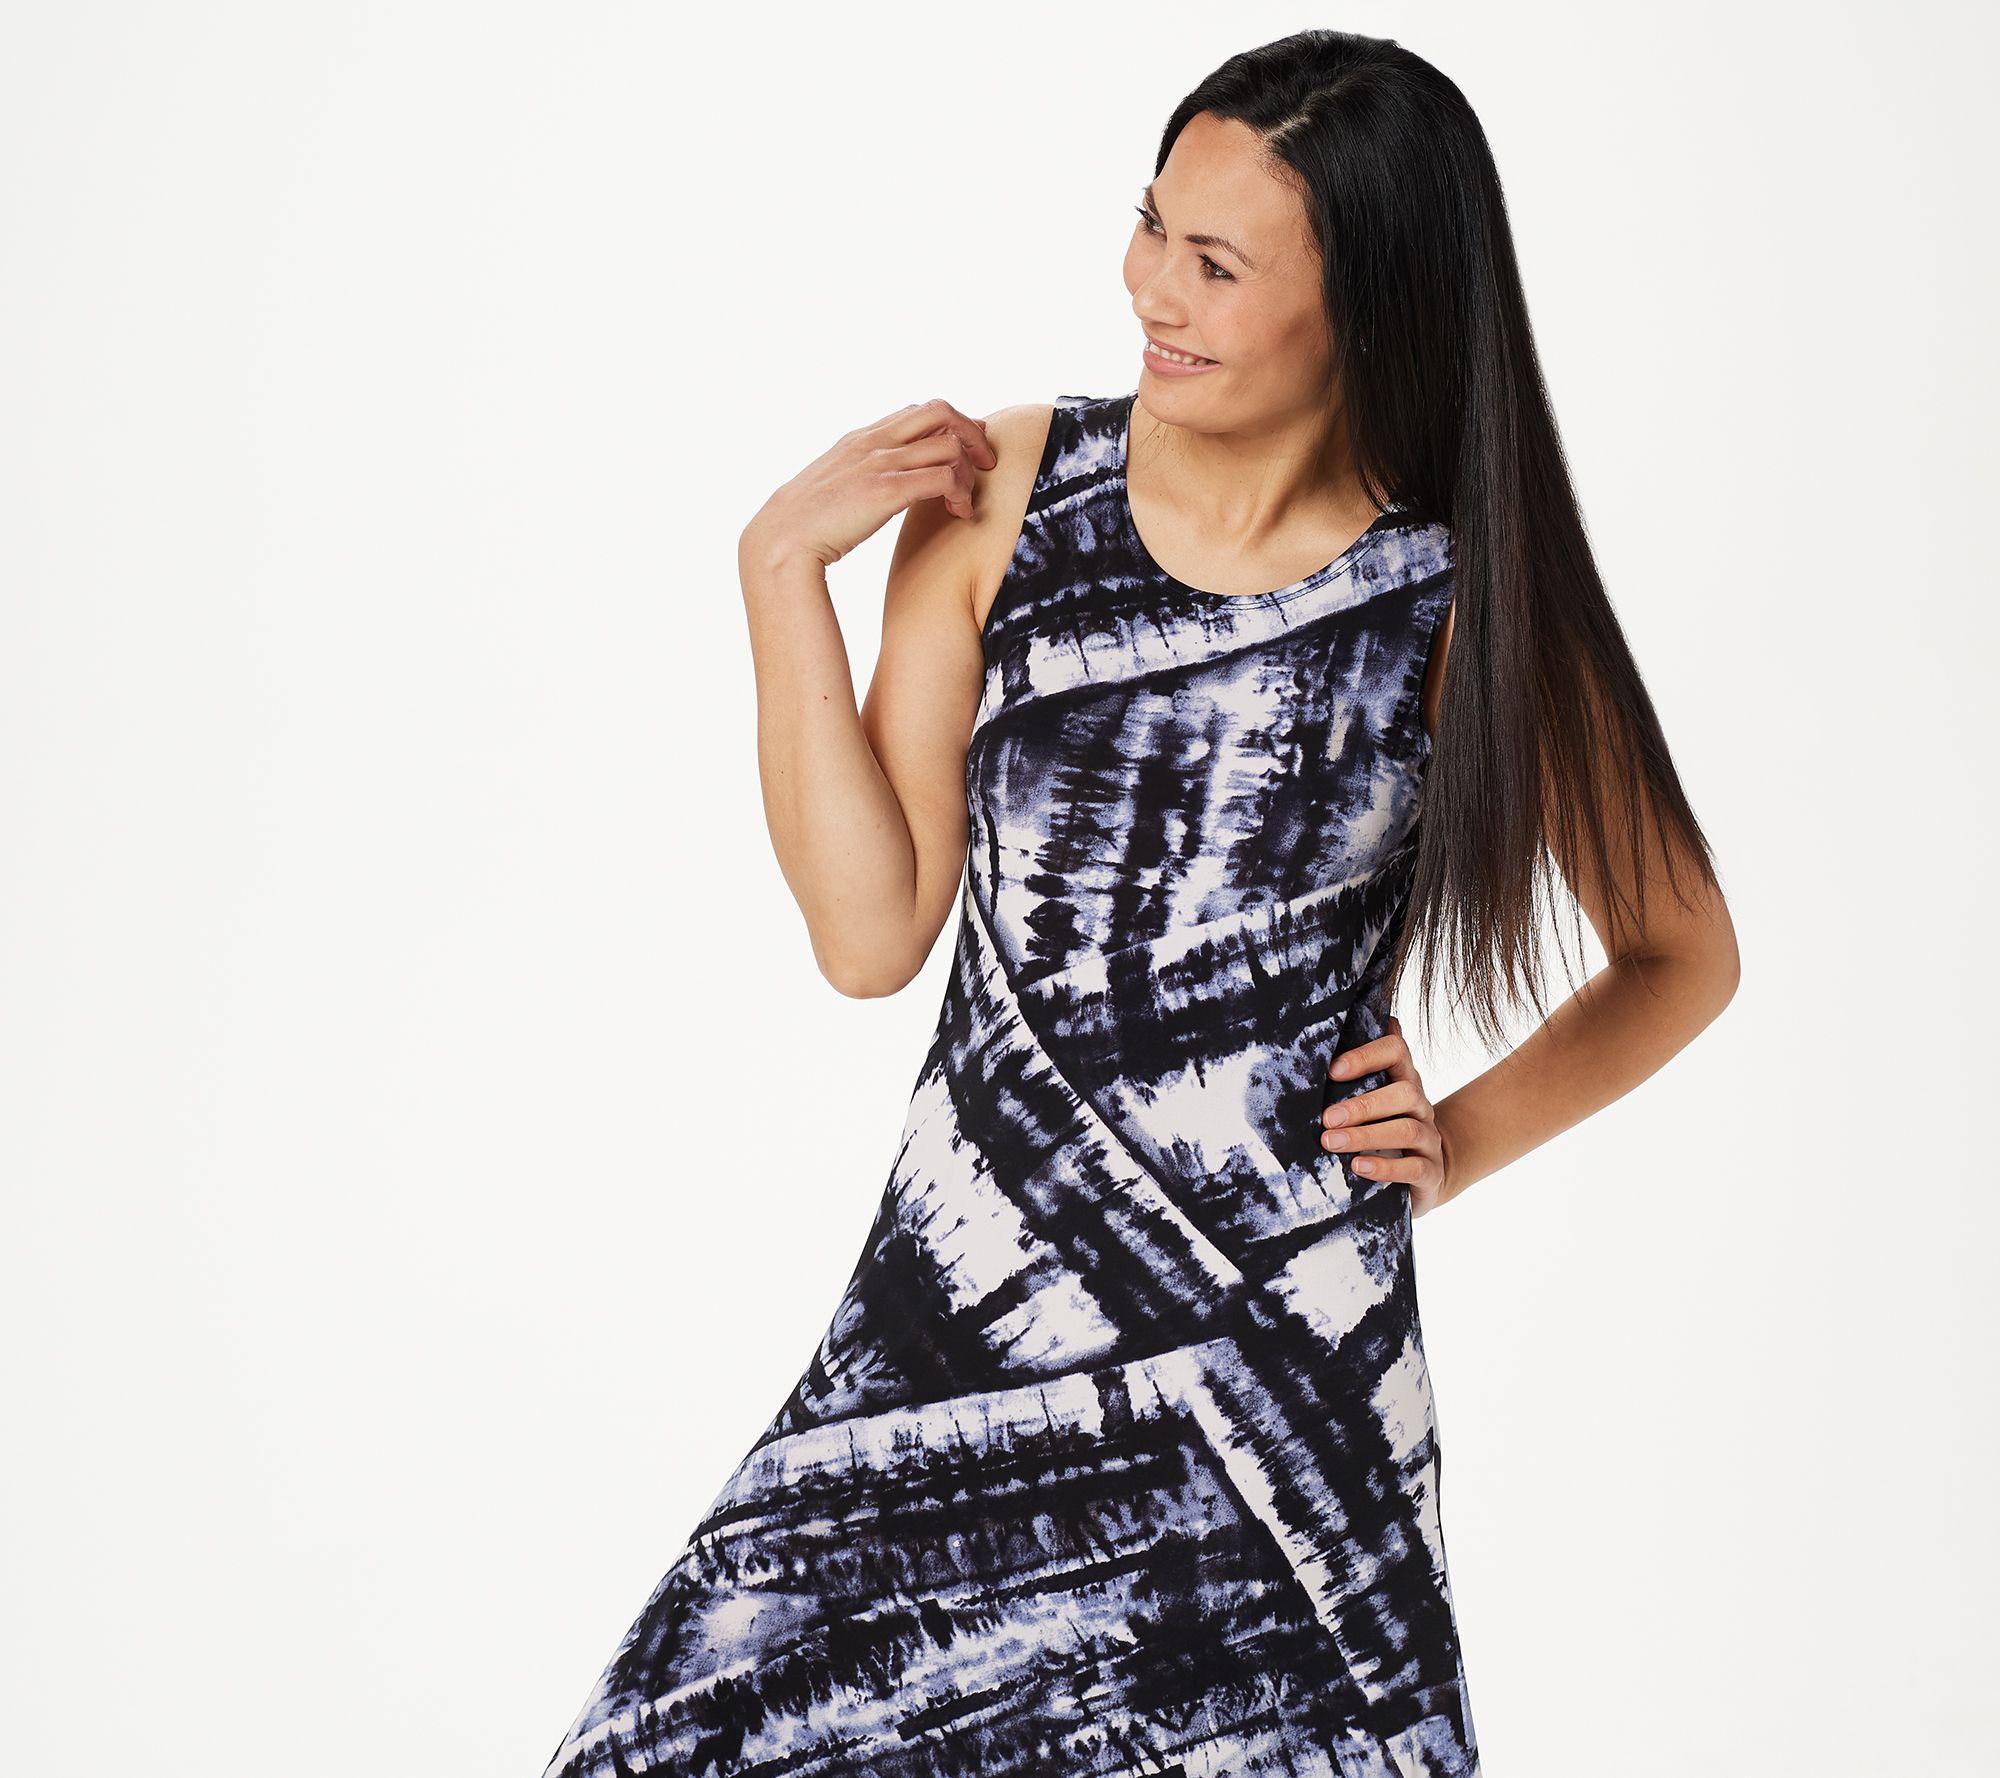 905683b5f820 Attitudes by Renee Regular Printed Maxi Dress with Cardigan - Page 1 —  QVC.com